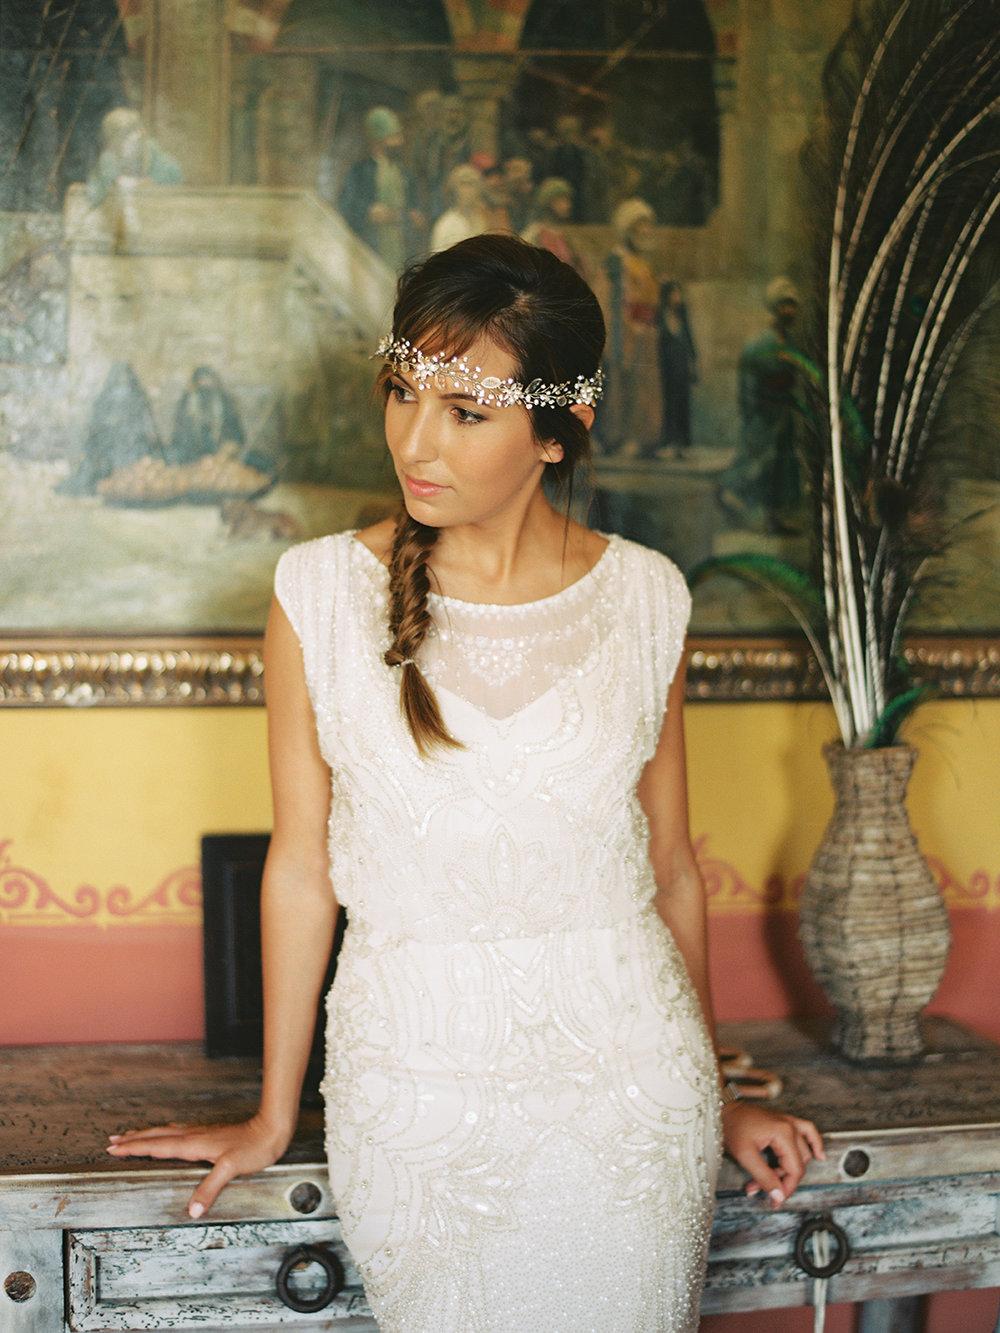 039_Dany+Sarah_Merida_Mexico_Wedding_Brumley & Wells_Fine_art_film_photography.jpg